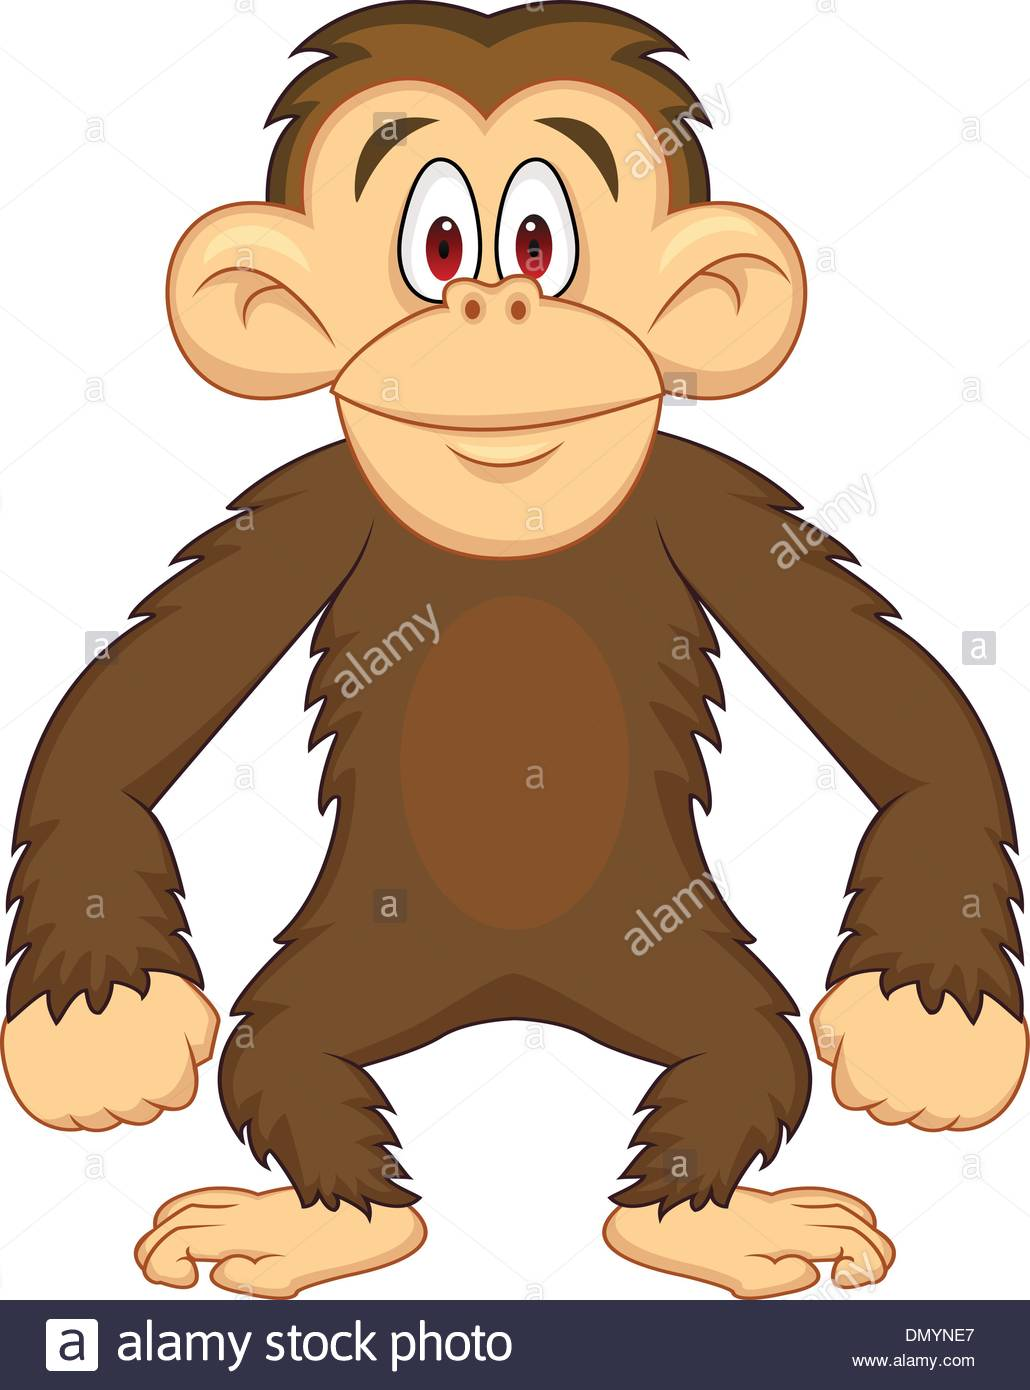 Chimpanzee cartoon Stock Vector Art & Illustration, Vector Image.